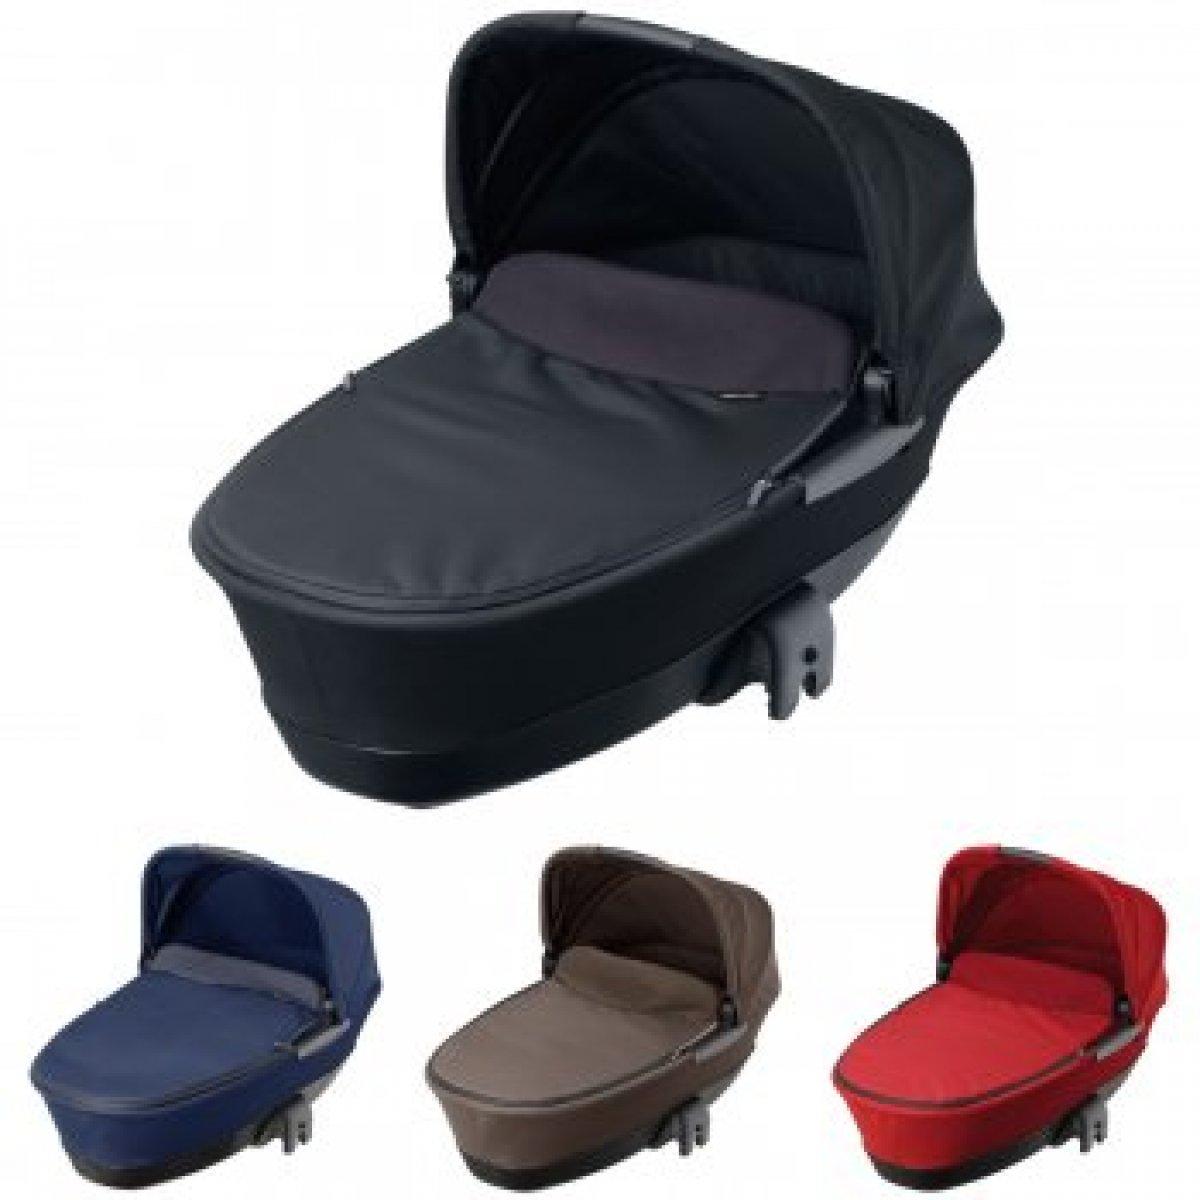 maxi cosi kindersitz mobi xp 9 25 kg design 2014 phantom ebay. Black Bedroom Furniture Sets. Home Design Ideas